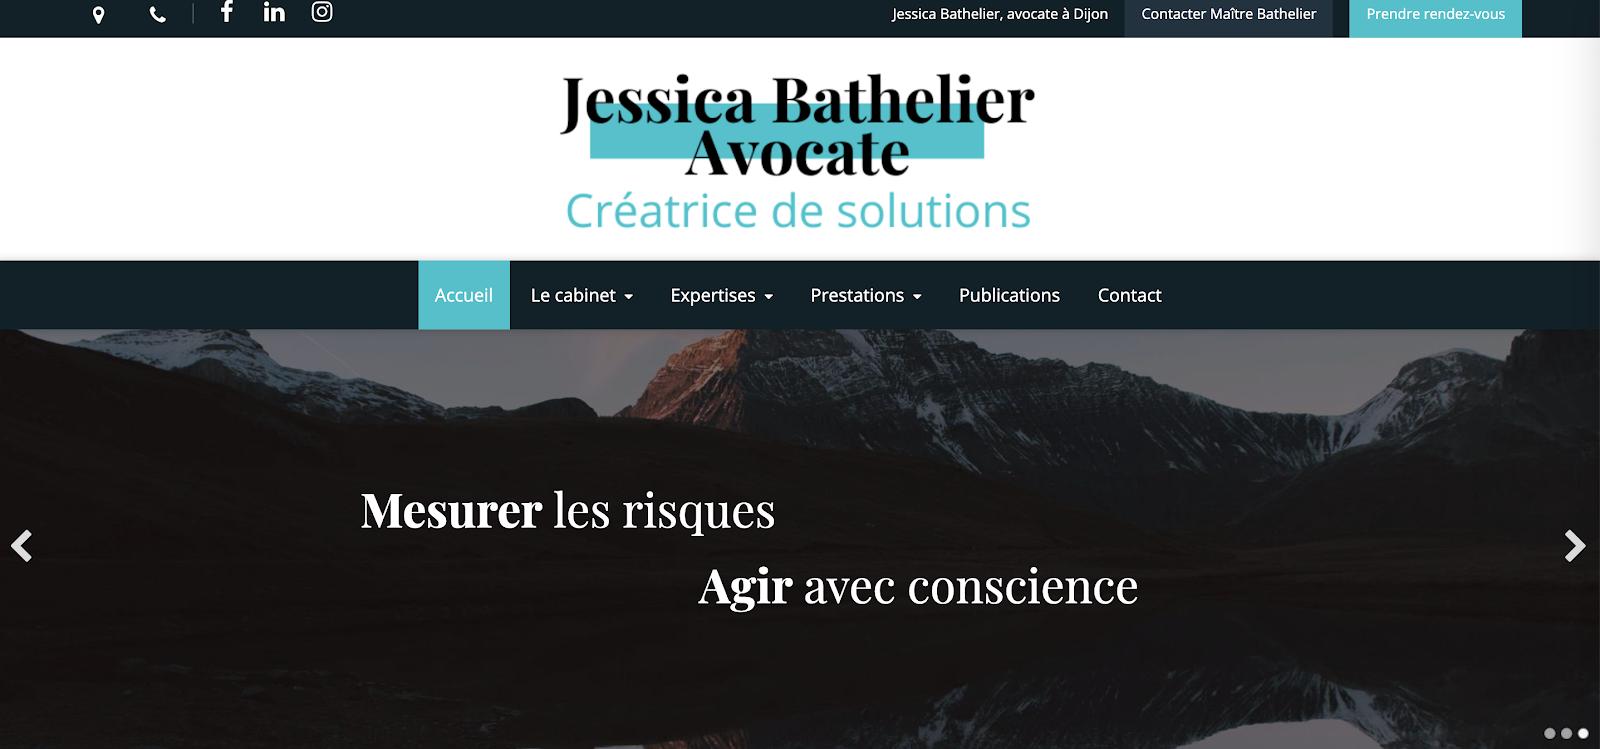 site Jessica Bathelier